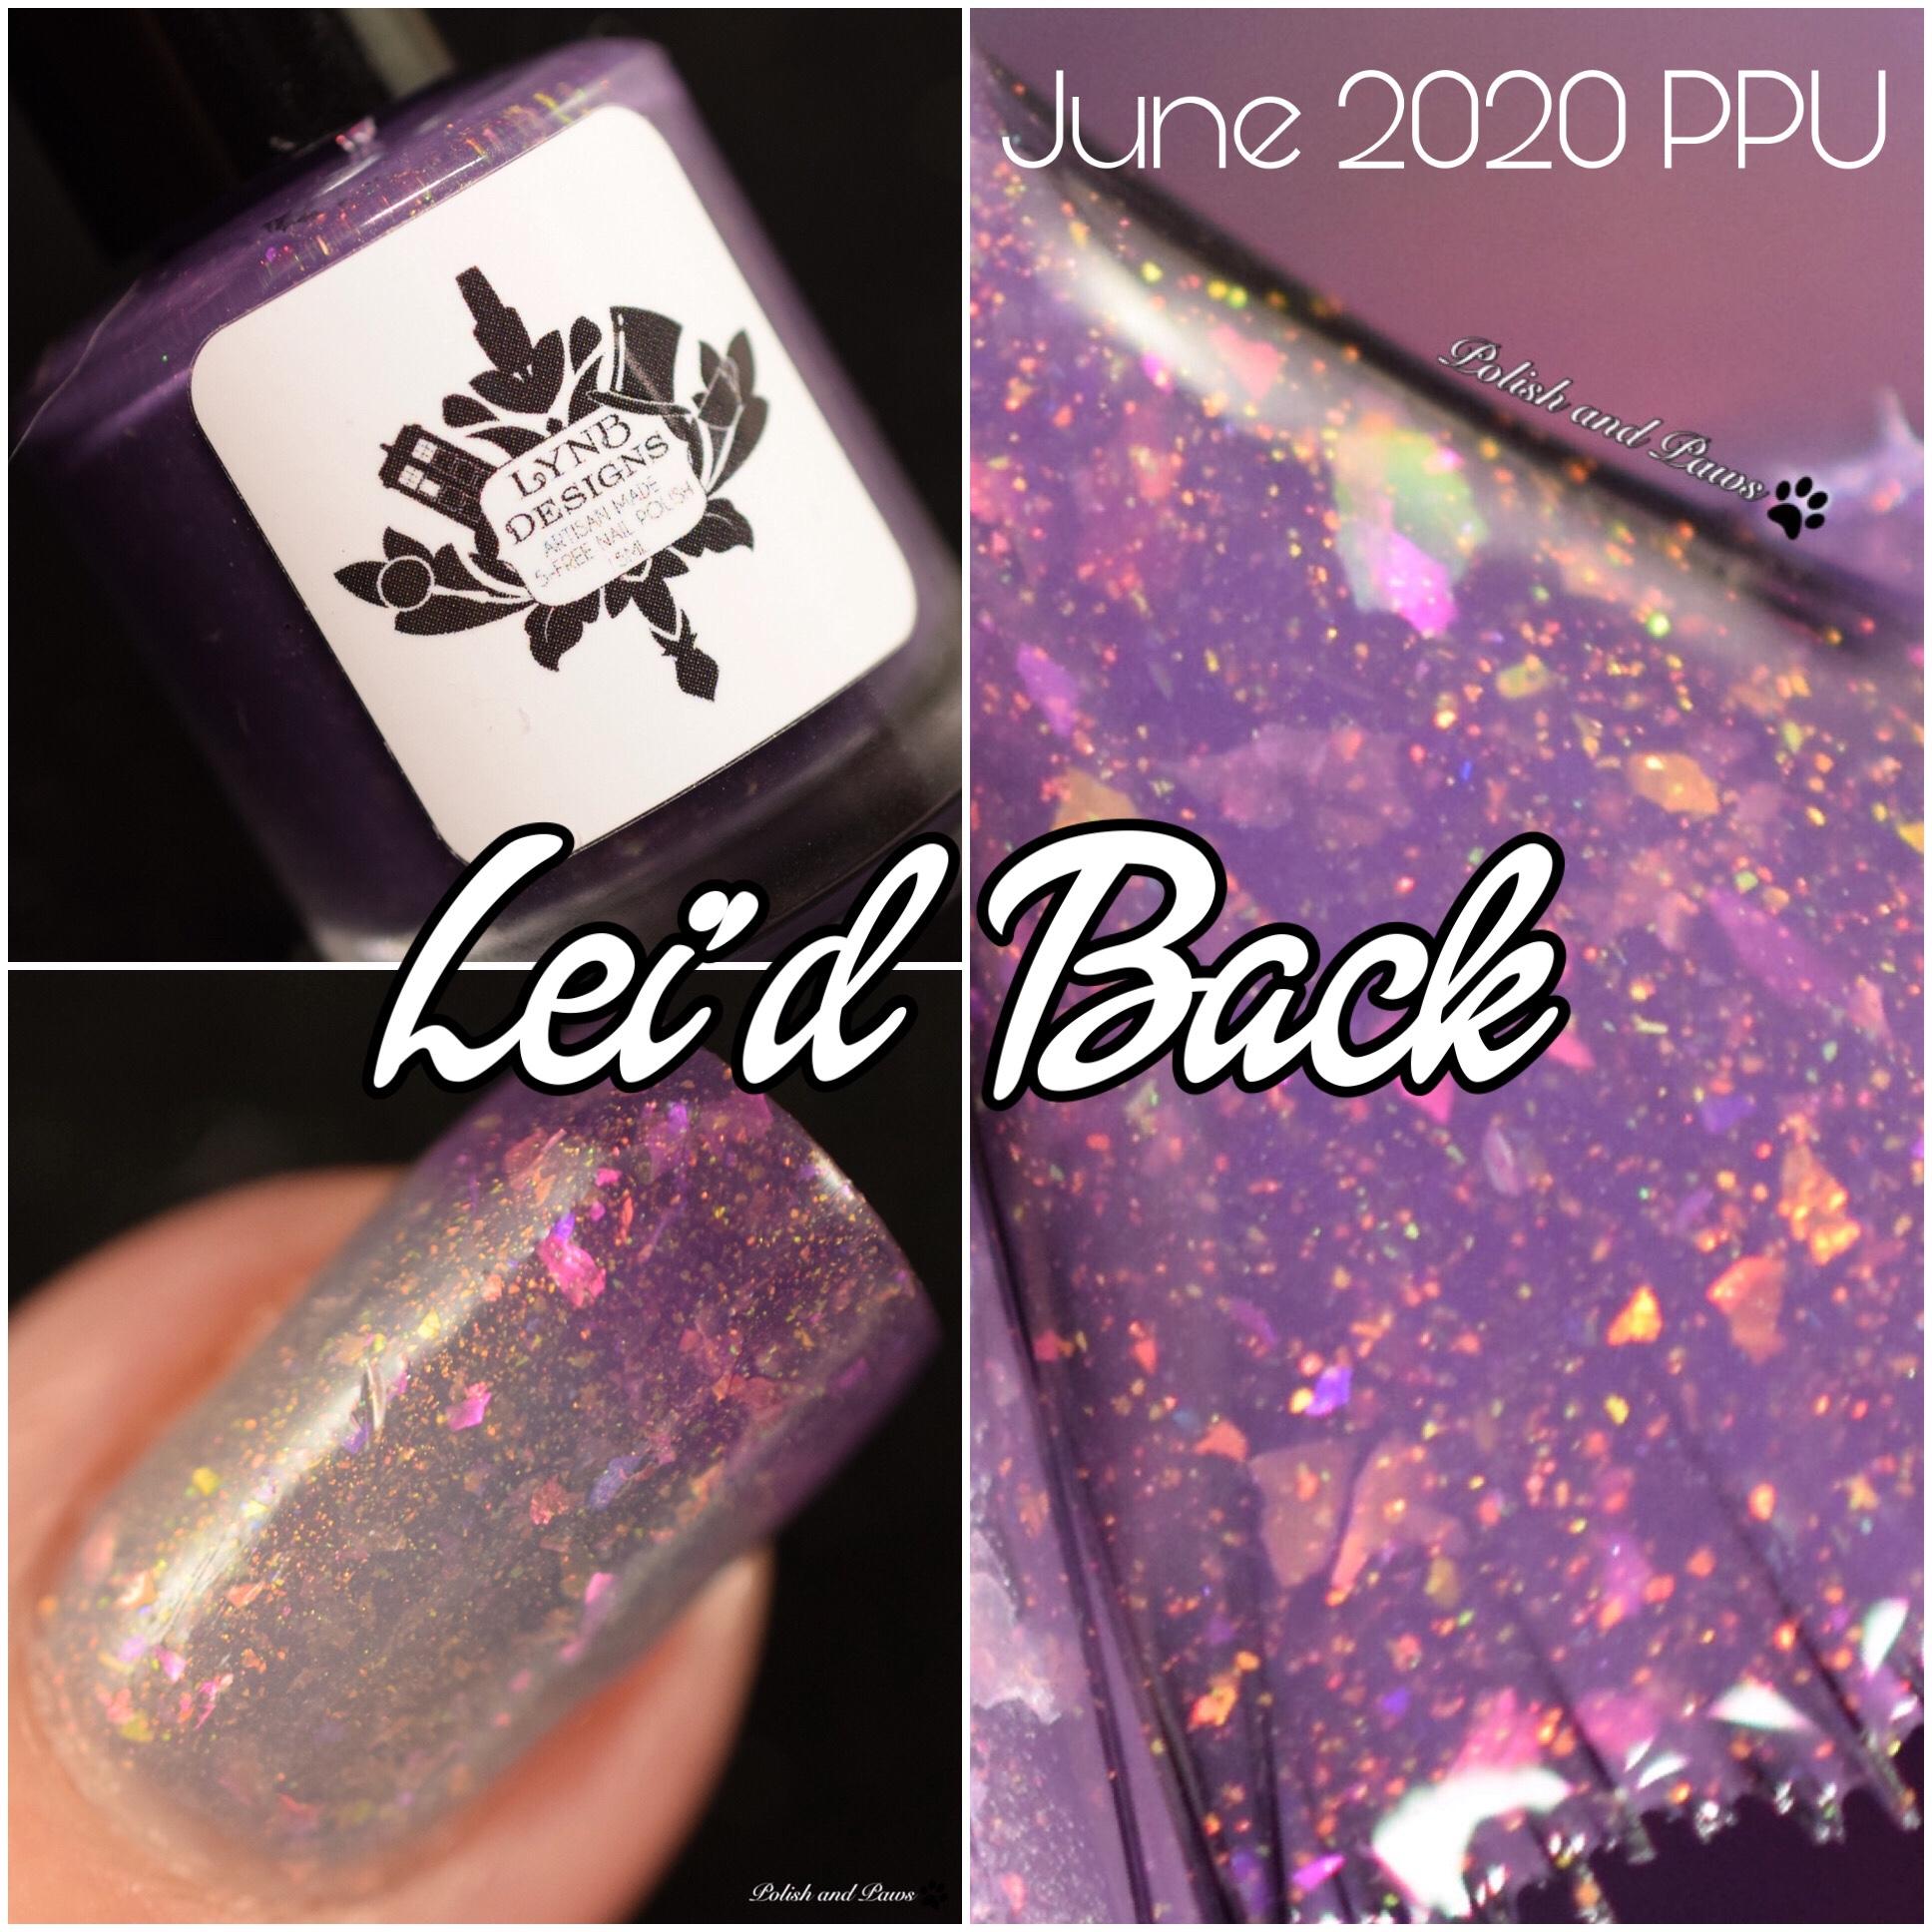 LynB Designs Lei'd Back